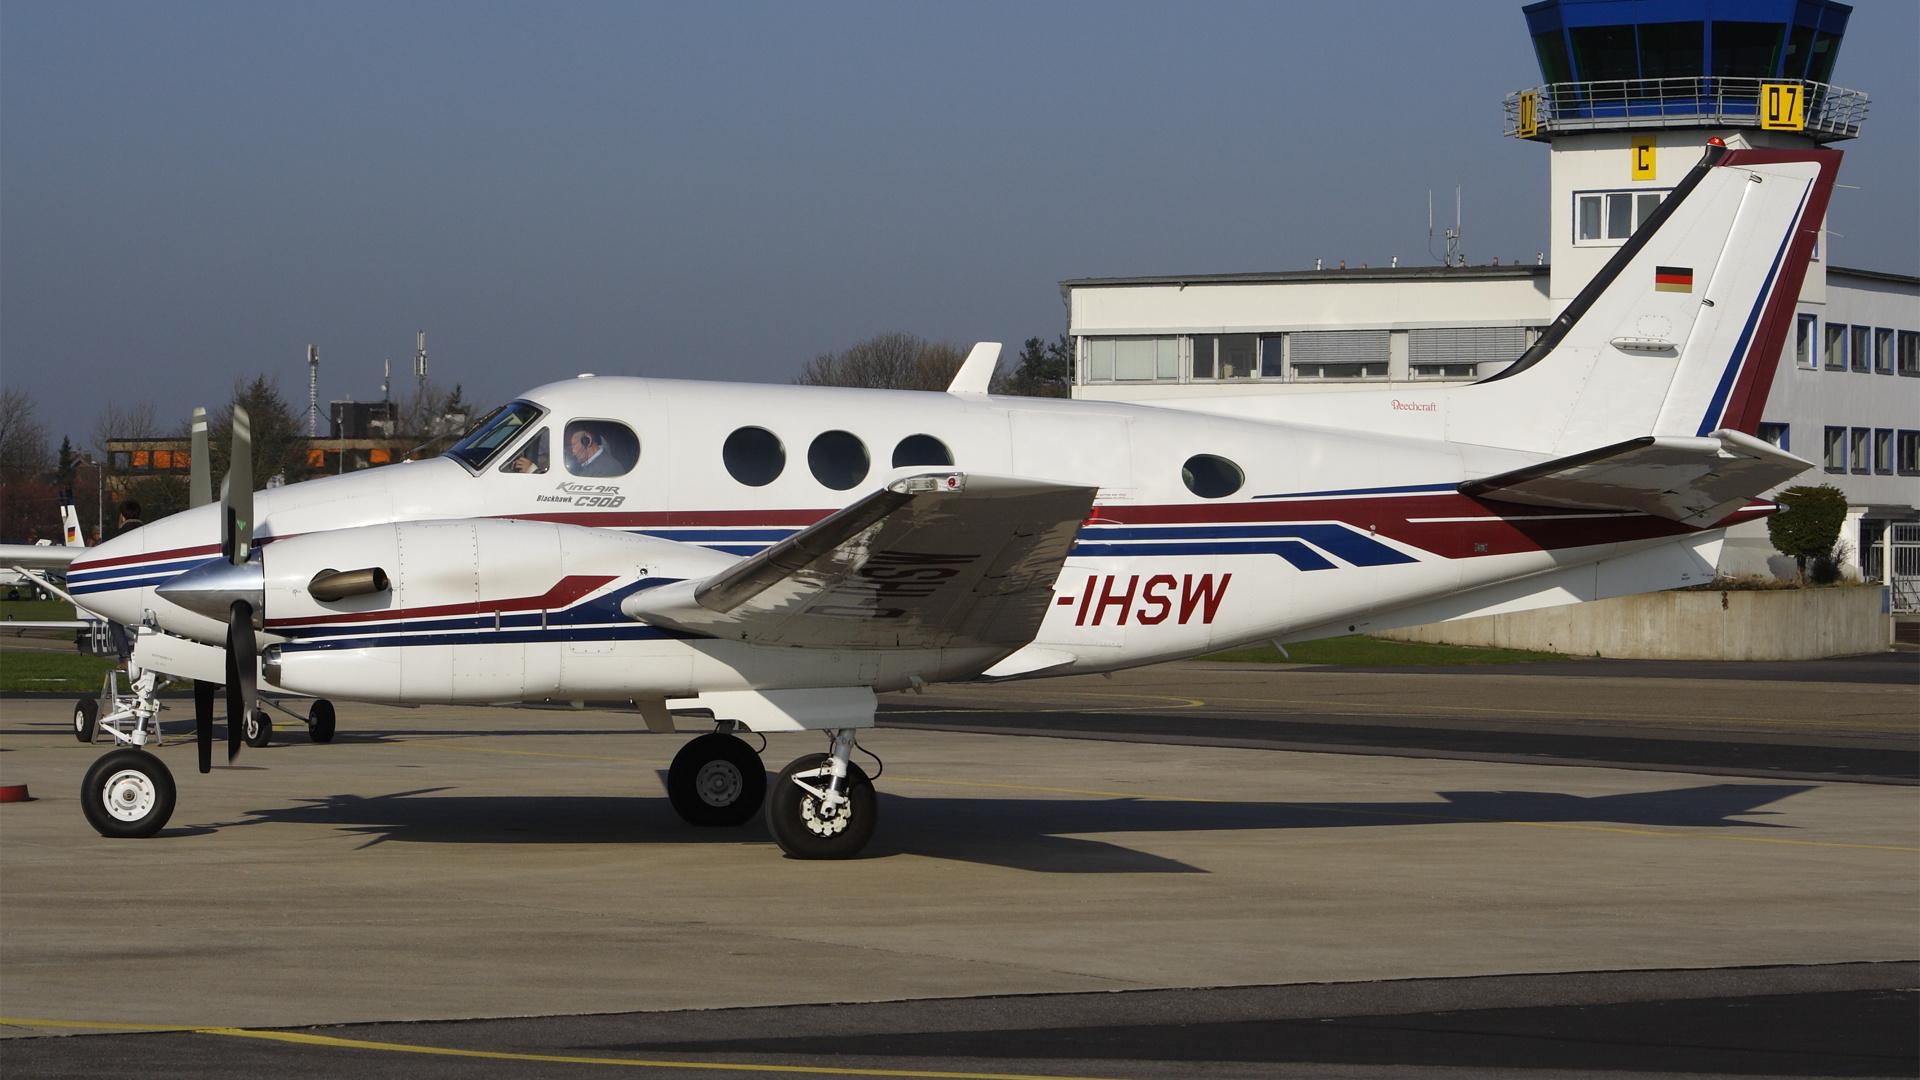 D-IHSW-1 B90 ESS 200904